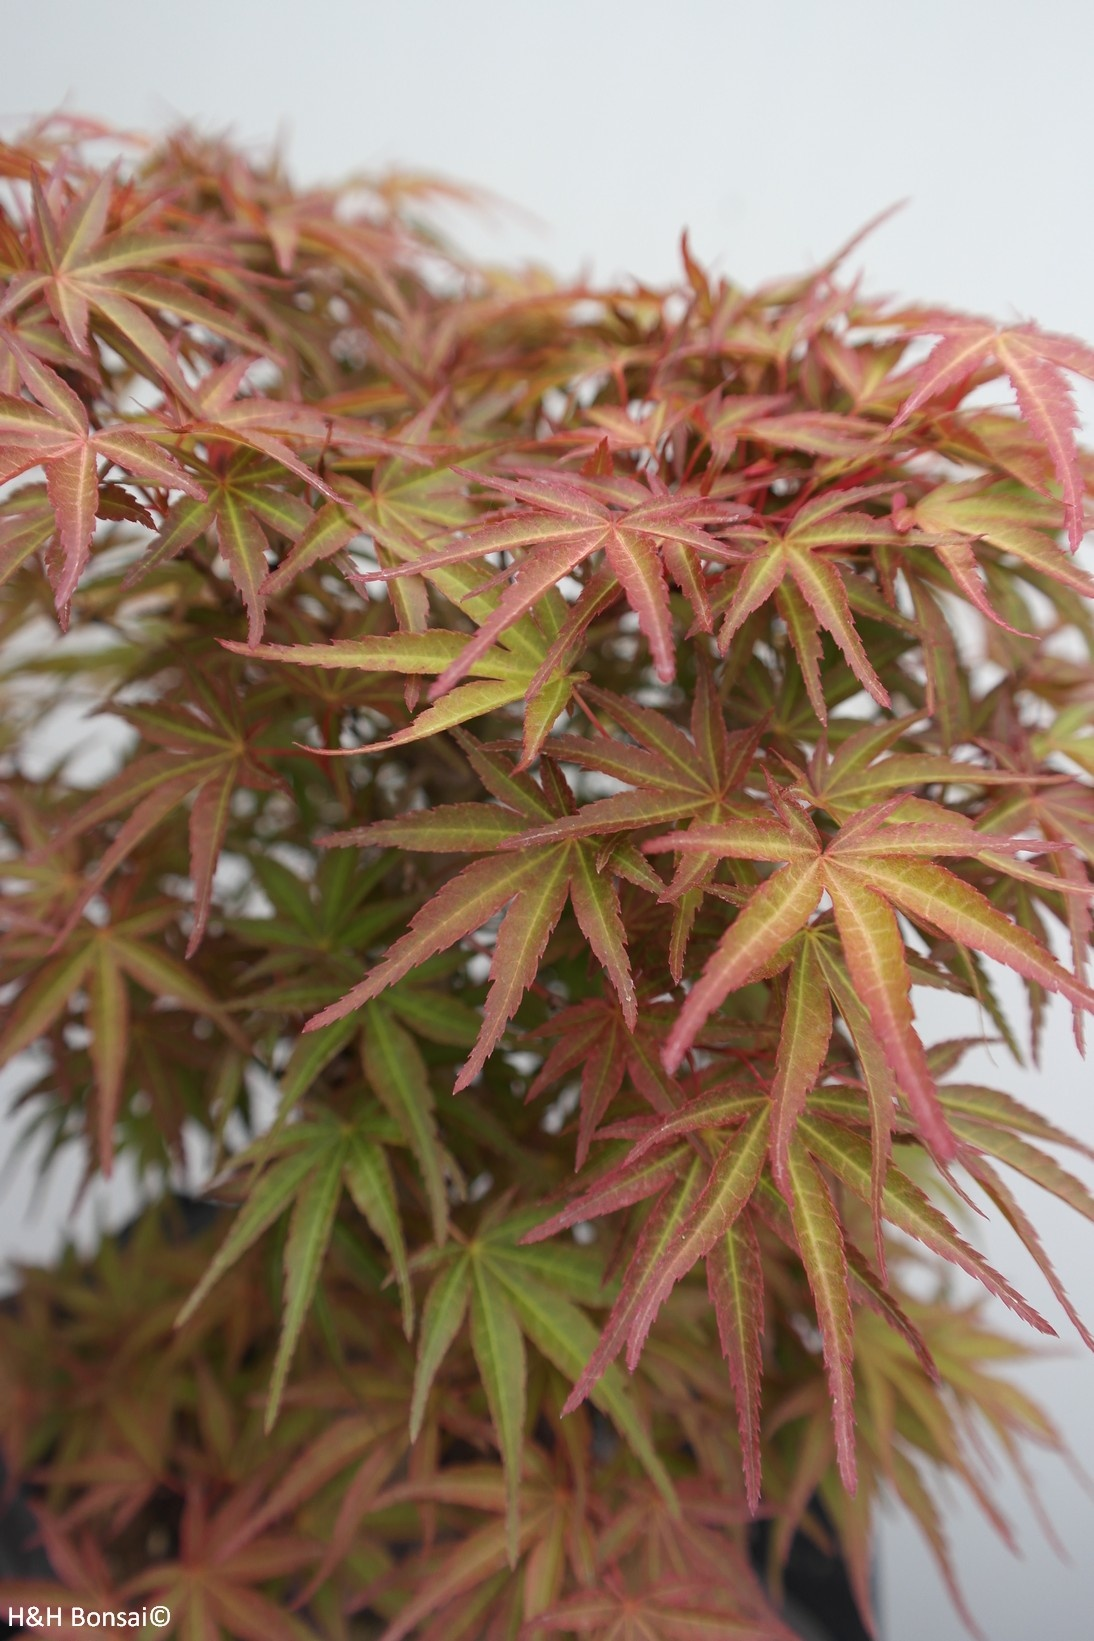 Bonsai Acero palmato, Acer palmatum, no. 7766